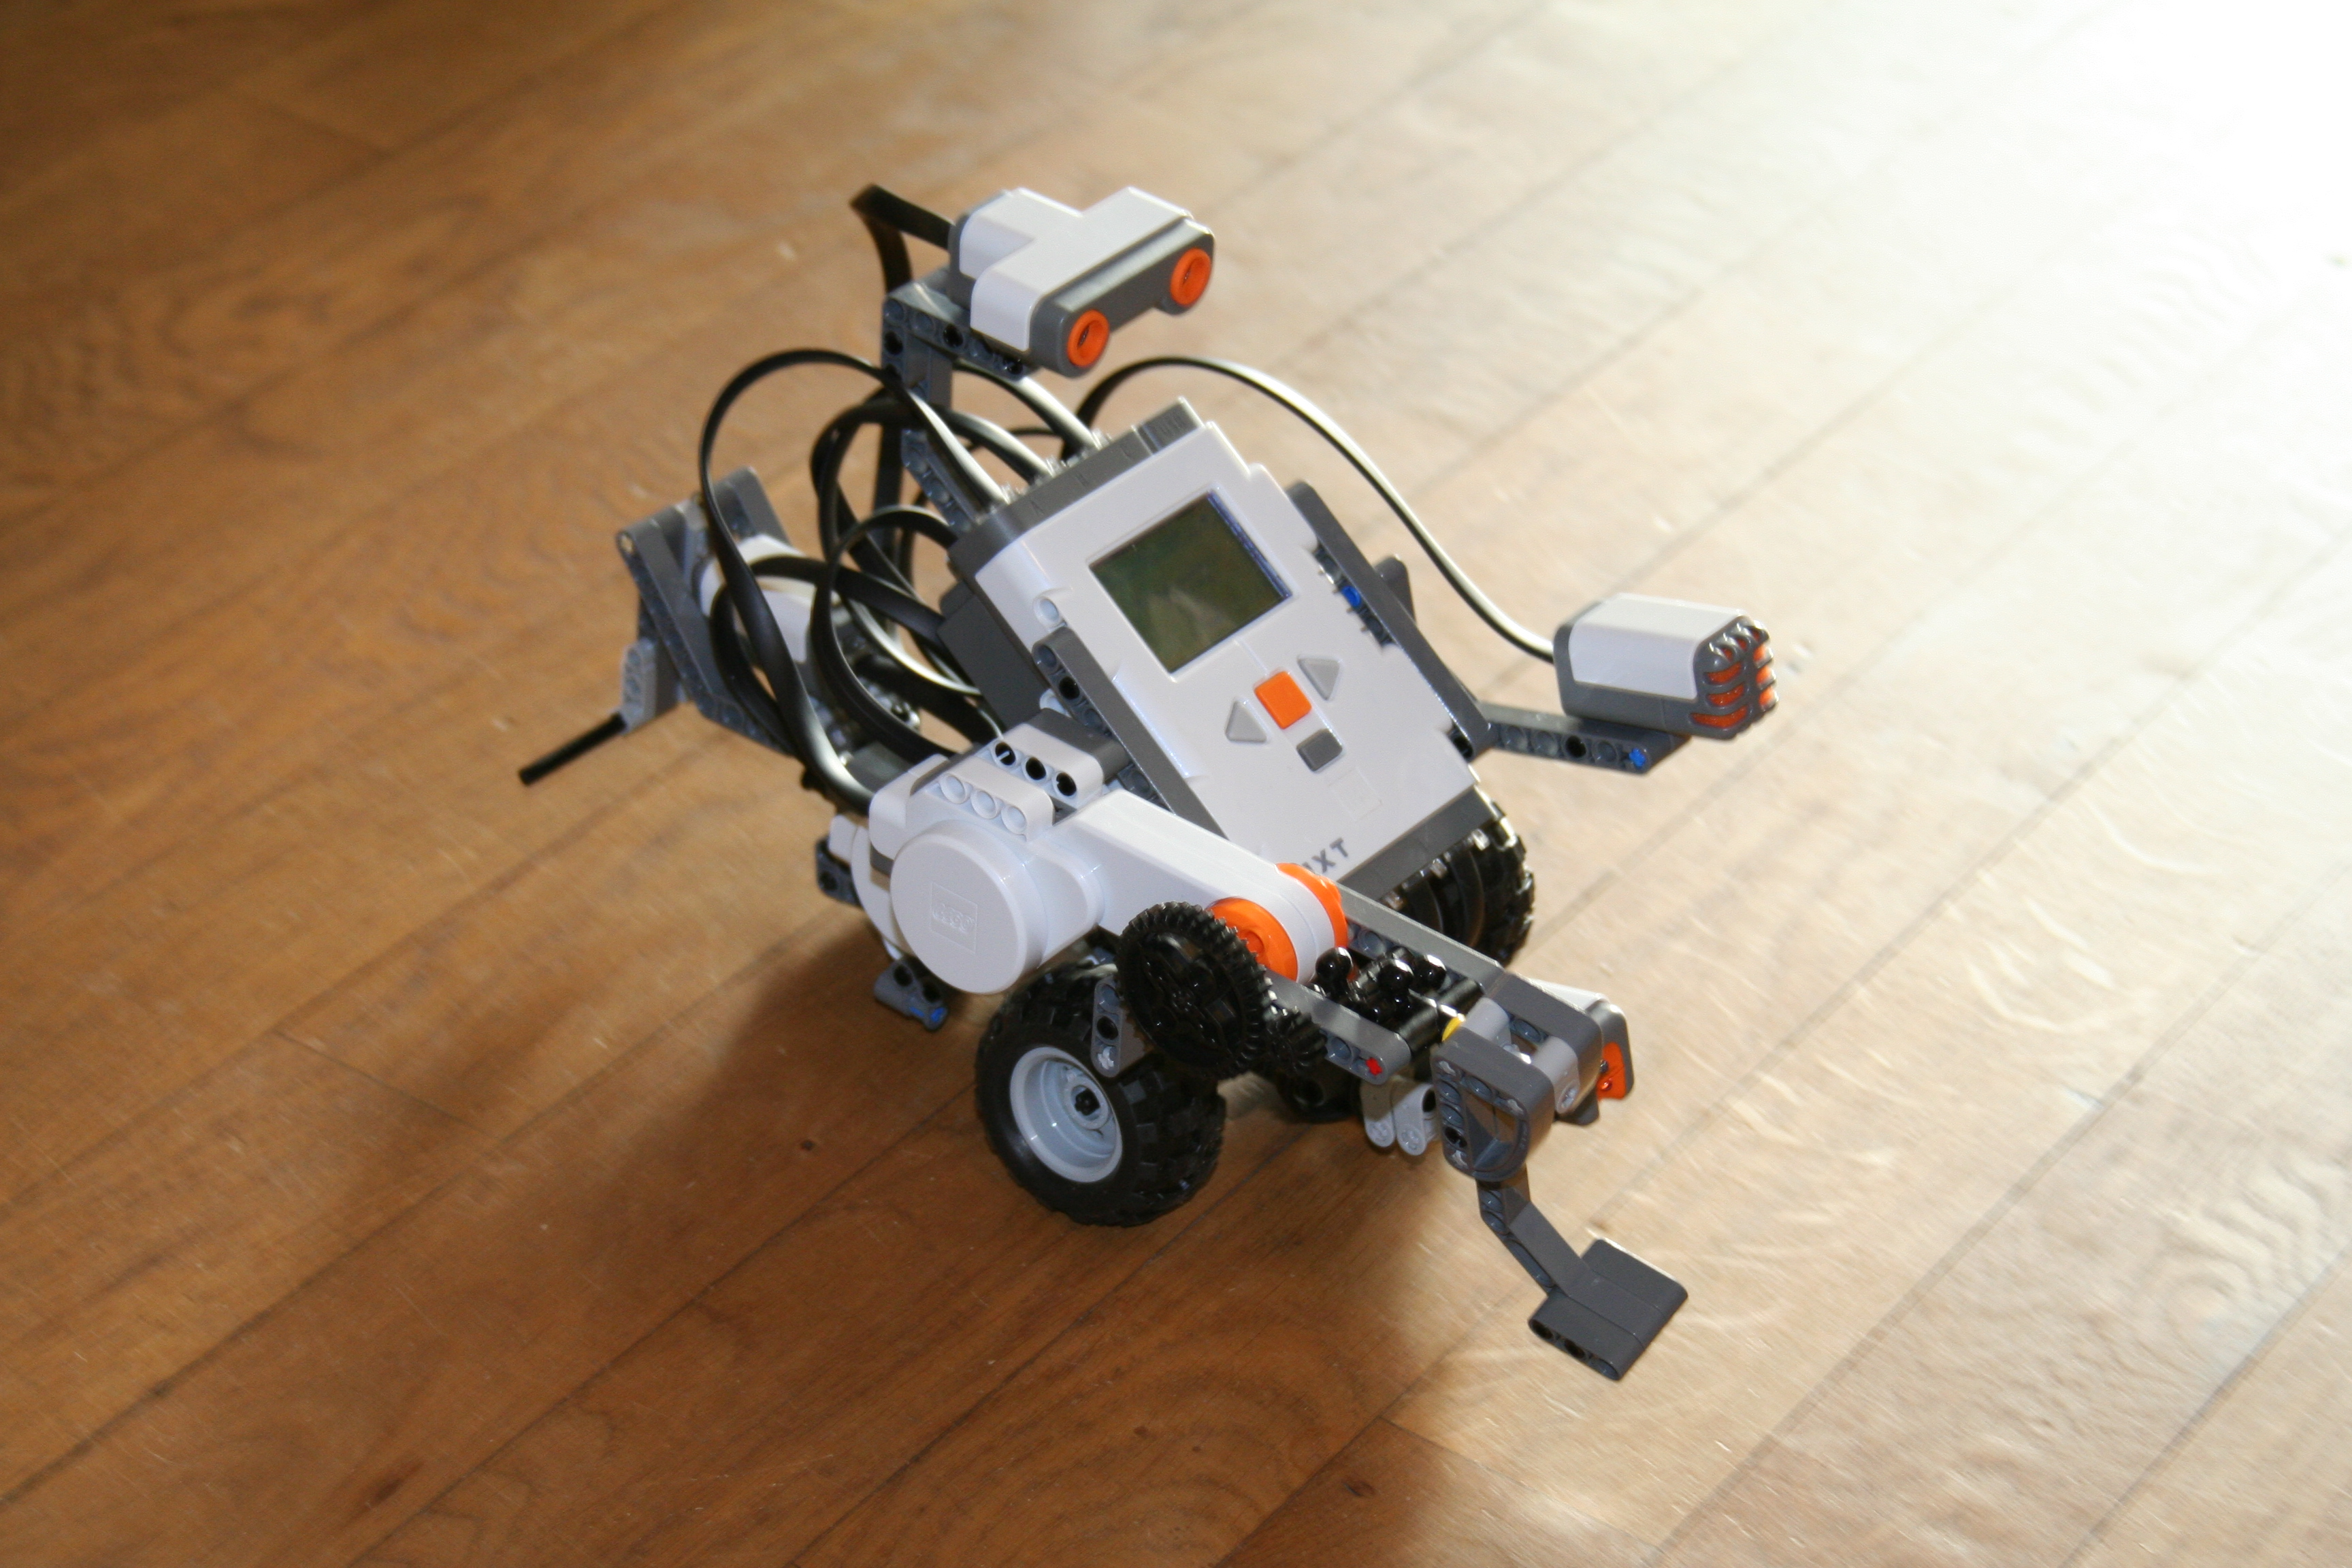 Lego_Mindstorms_Nxt-FLL